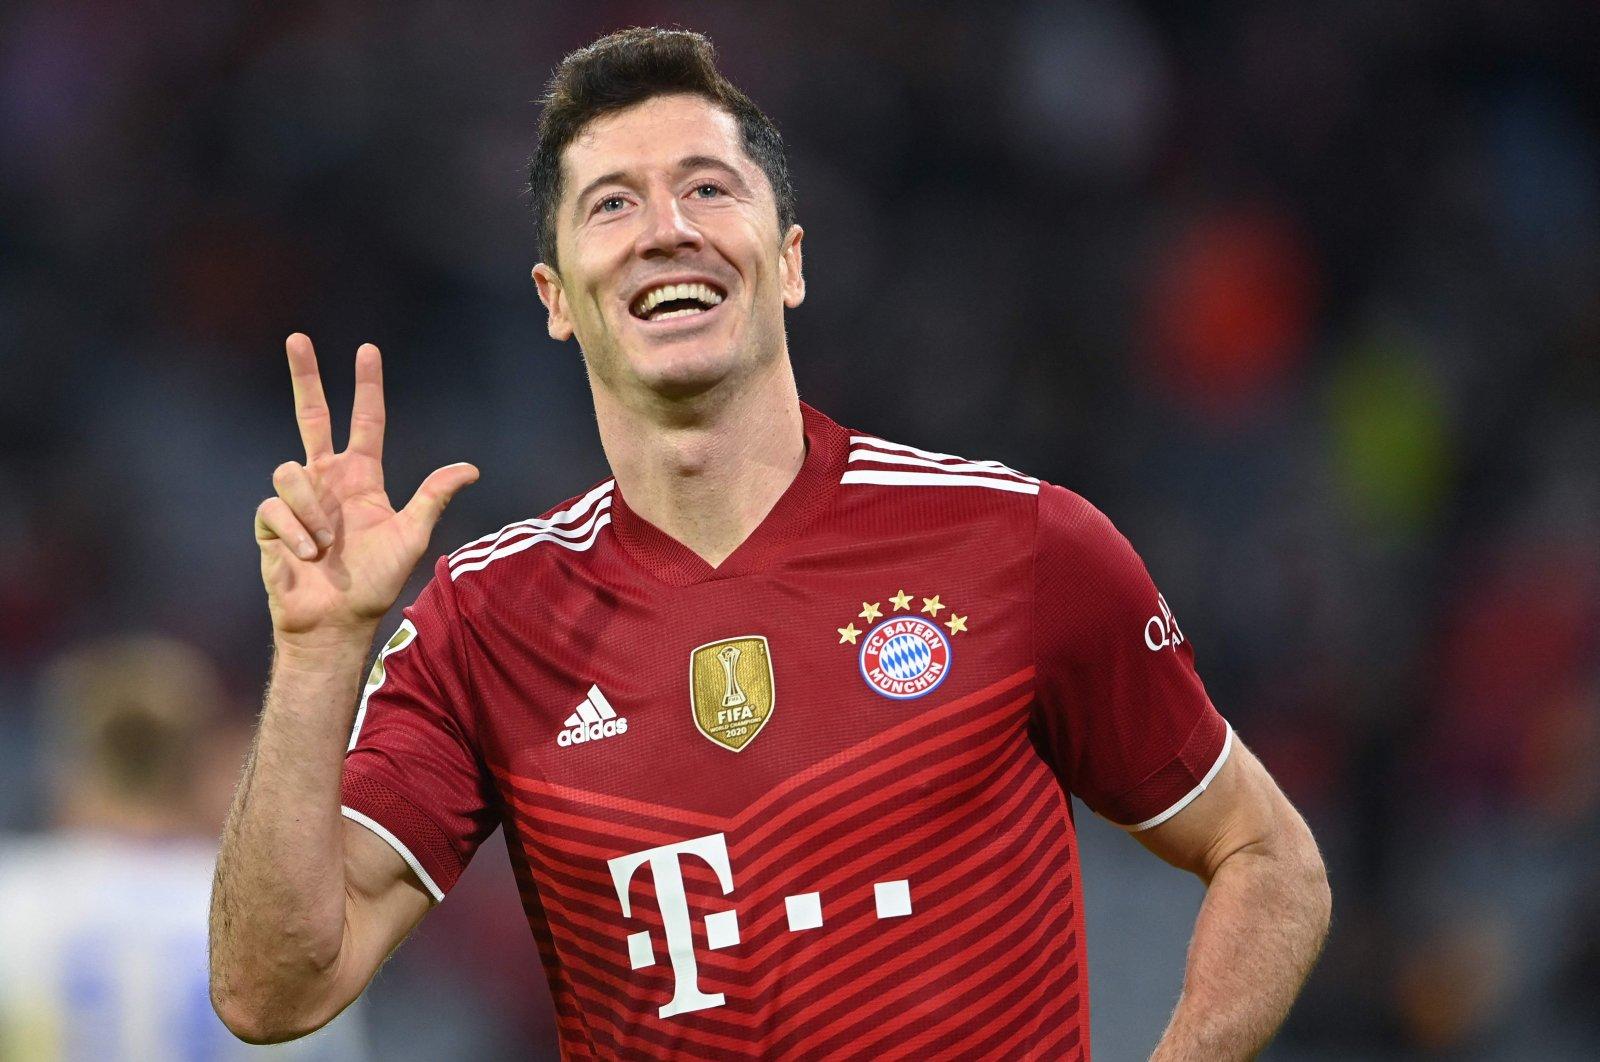 Bayern Munich's Polish forward Robert Lewandowski celebrates scoring his hat trick during the Bundesliga football match between FC Bayern Munich and Hertha BSC Berlin in Munich, southern Germany, Aug. 28, 2021. (AFP Photo)